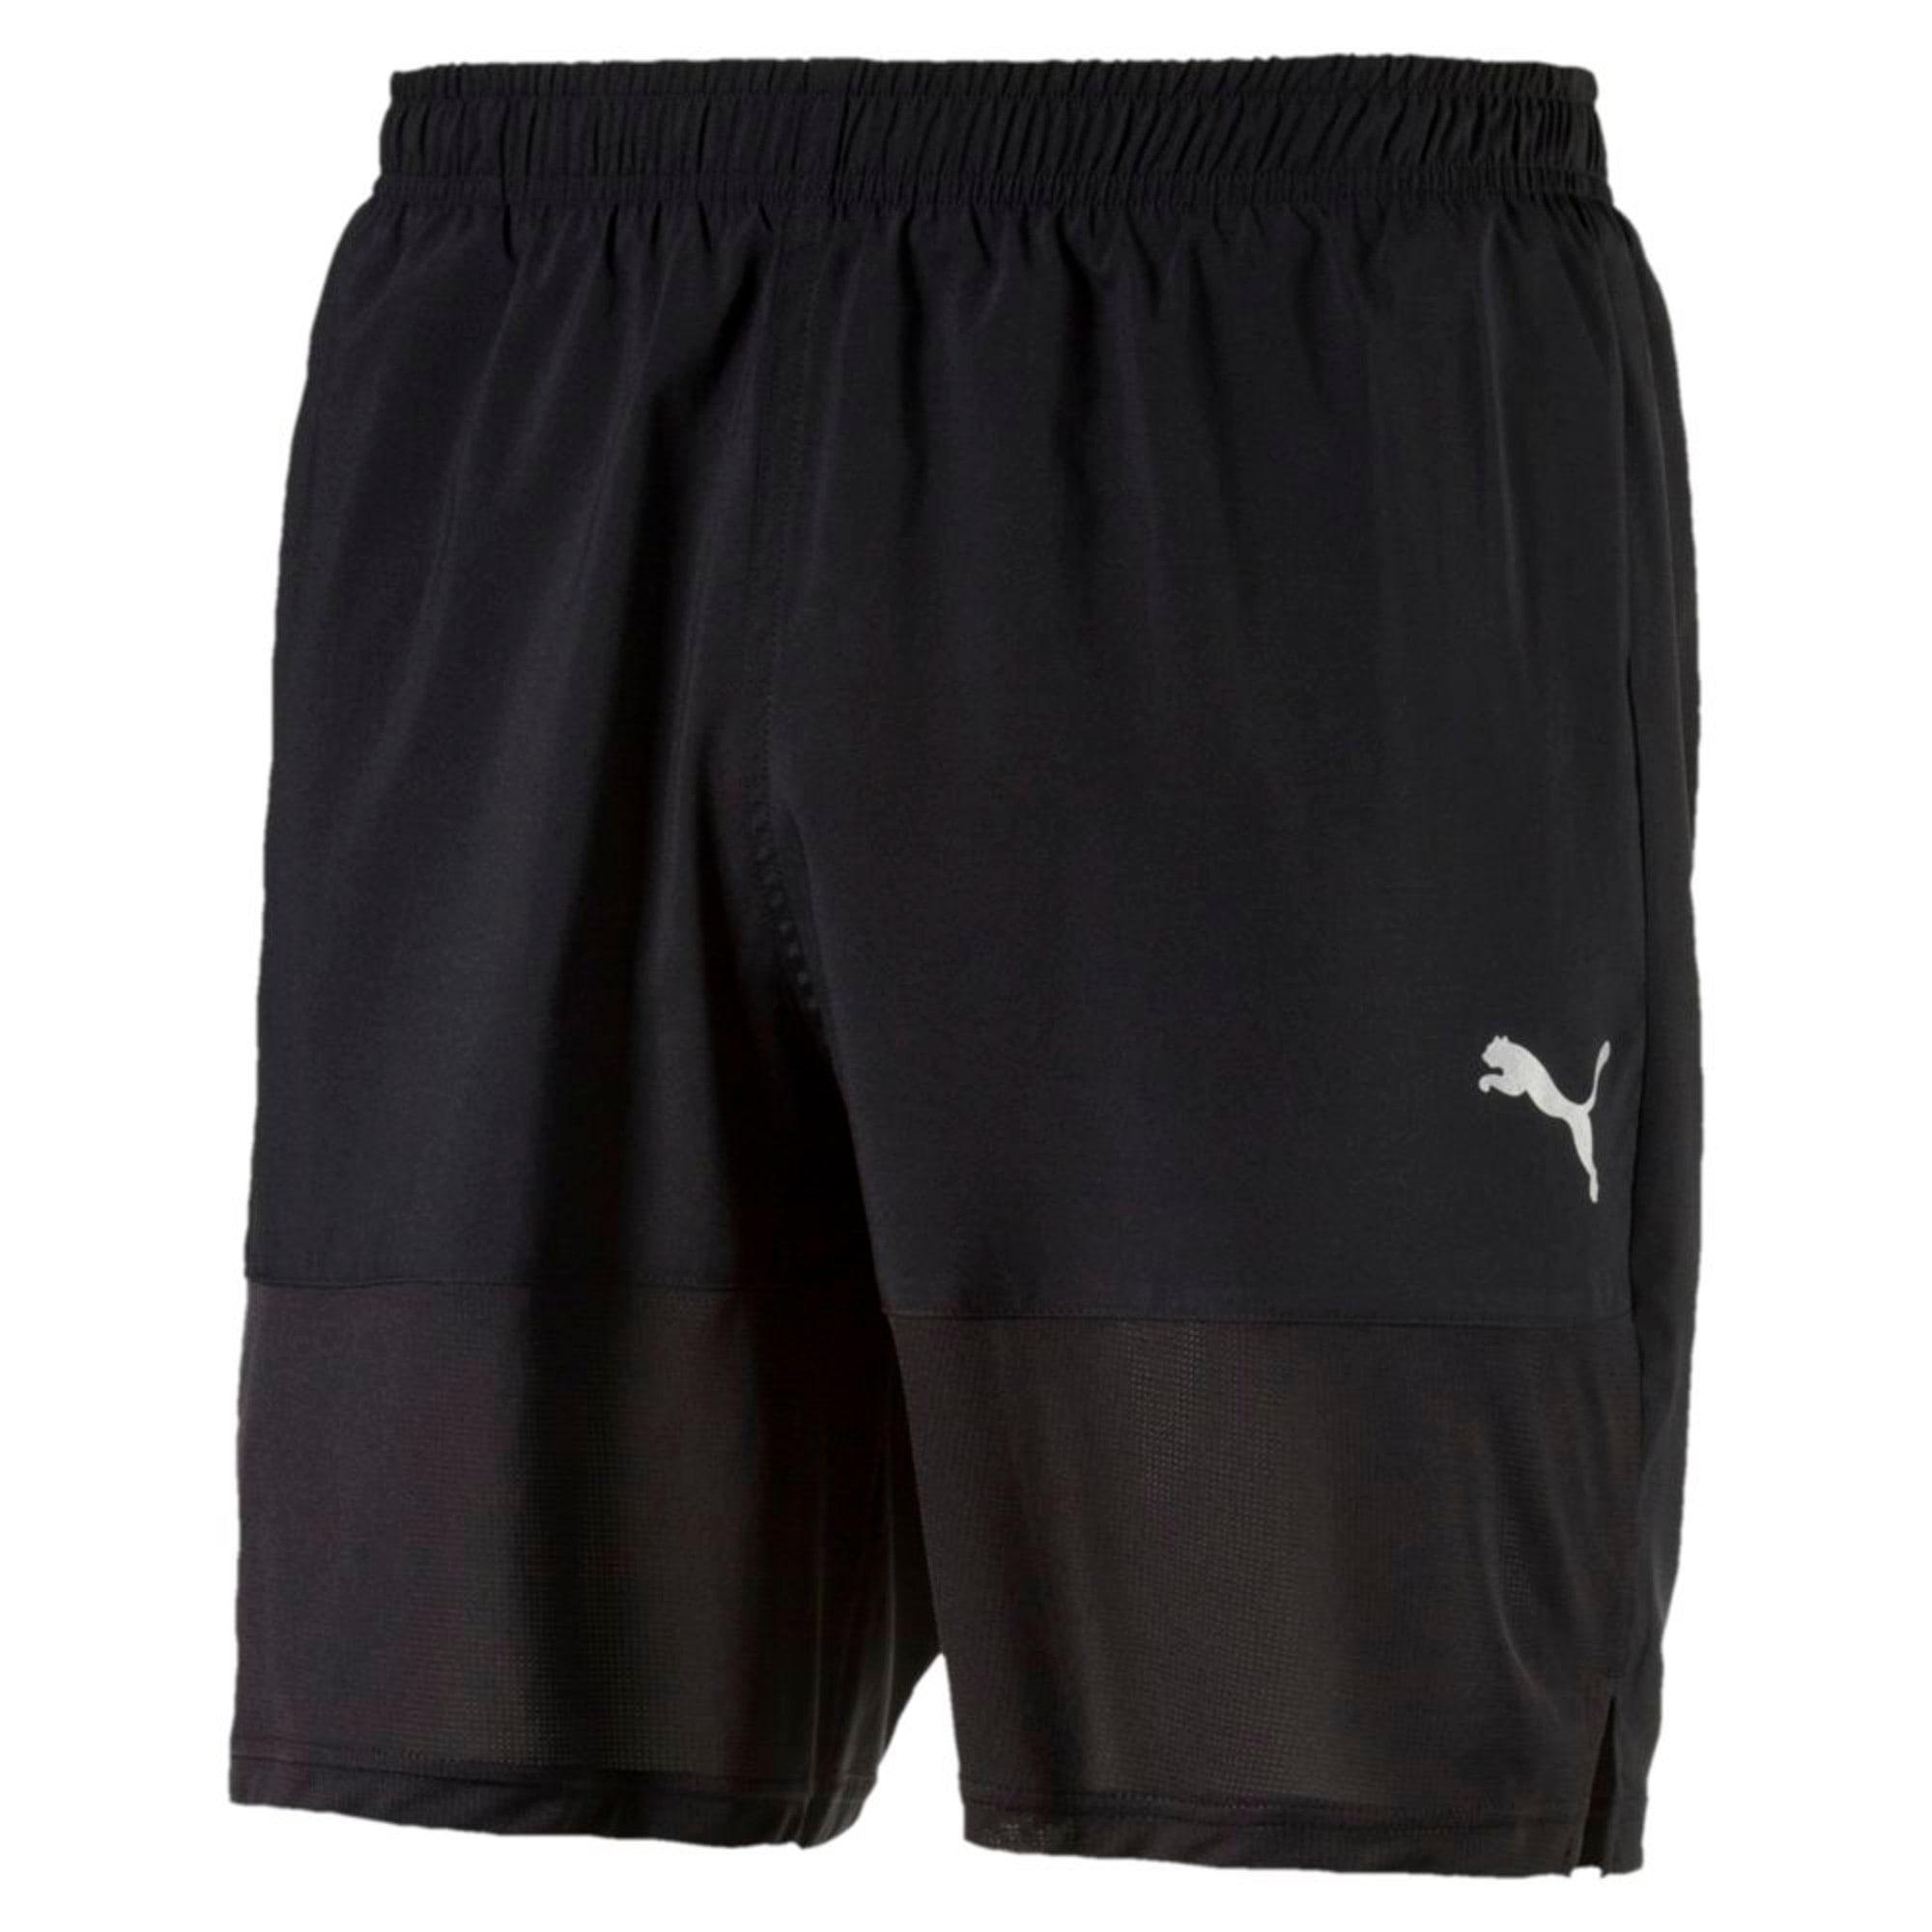 "Thumbnail 3 of Ignite 7"" Men's Running Shorts, Puma Black, medium-IND"